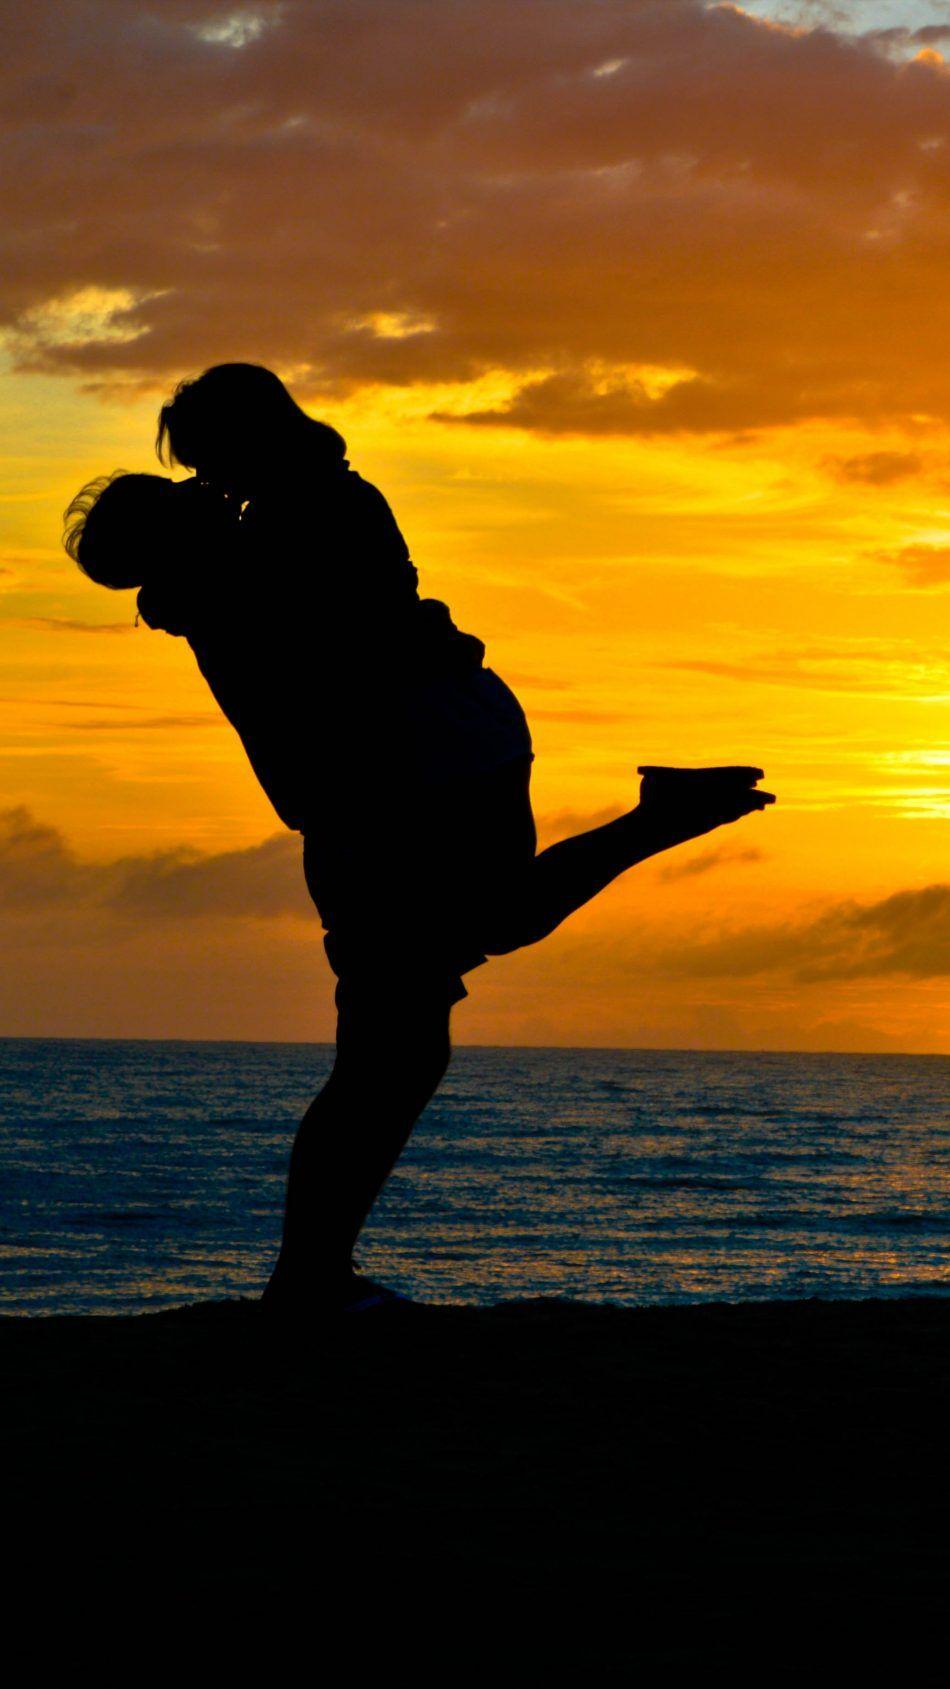 Couple Romantic Kiss Sea Sunset Silhouette 4k Ultra Hd Mobile Wallpaper Couple Sunset Sunset Silhouette Love Wallpapers Romantic Couple Wallpaper